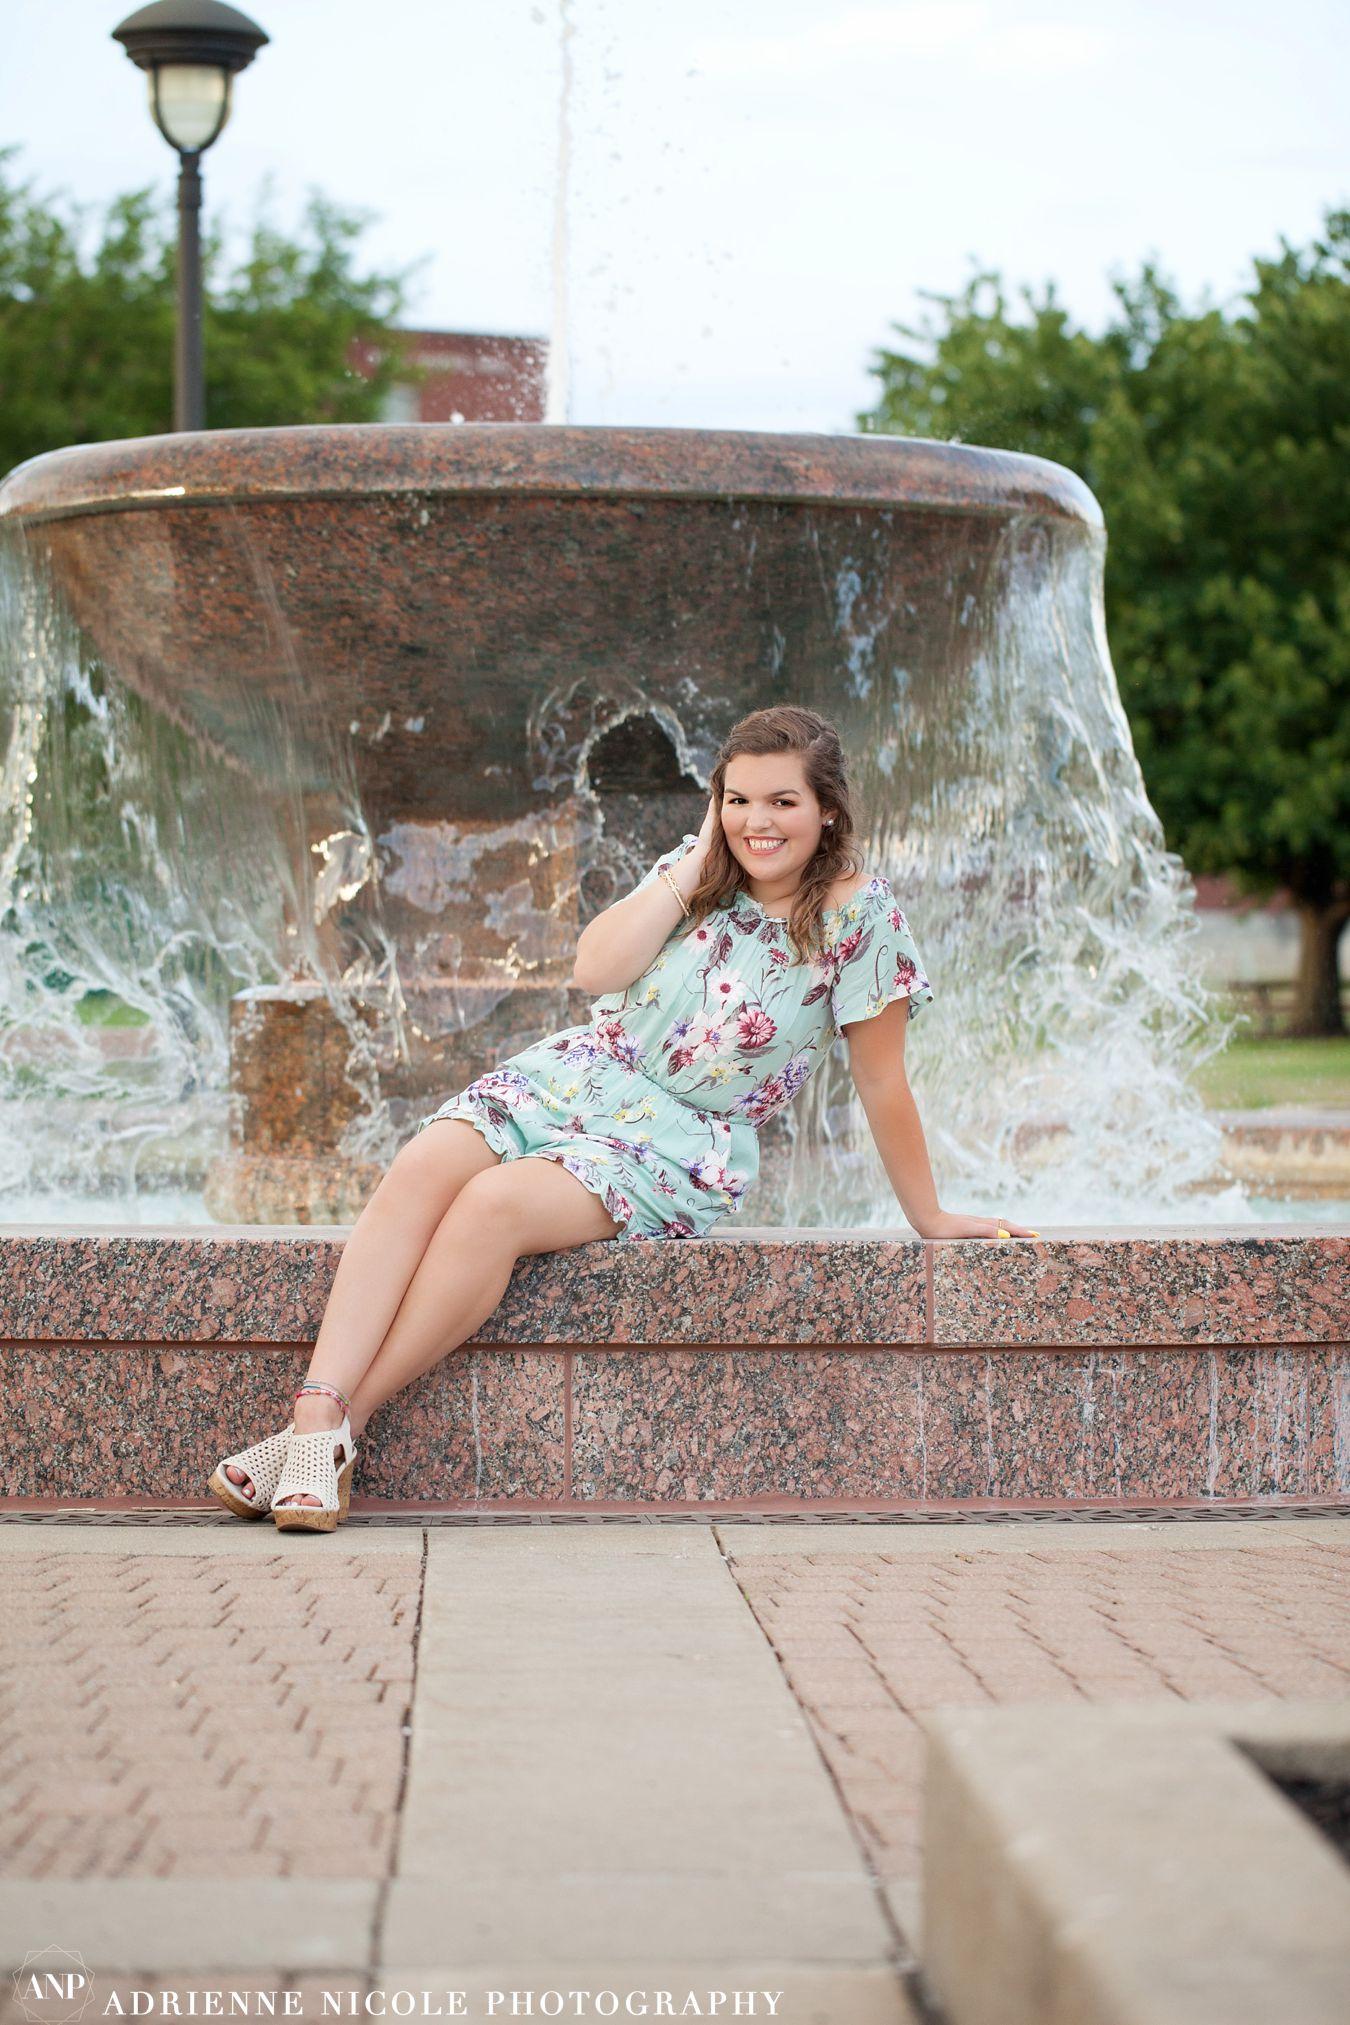 Adrienne Nicole Photography_IndianaSeniorPhotographer_Avon_0183.jpg